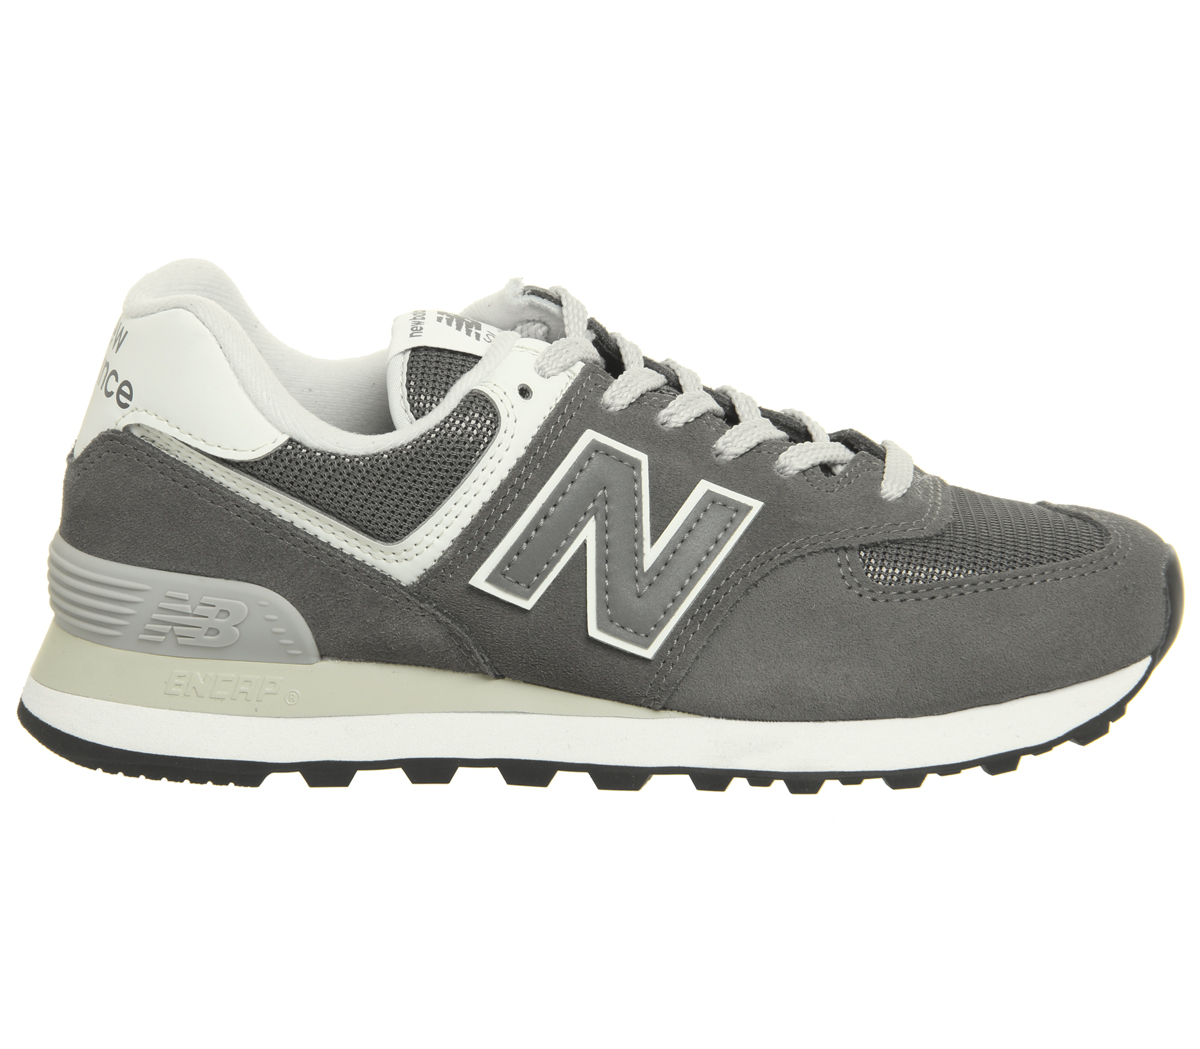 Chaussures 574 Balance femme New Trainers Rock Castle rqrfUxt